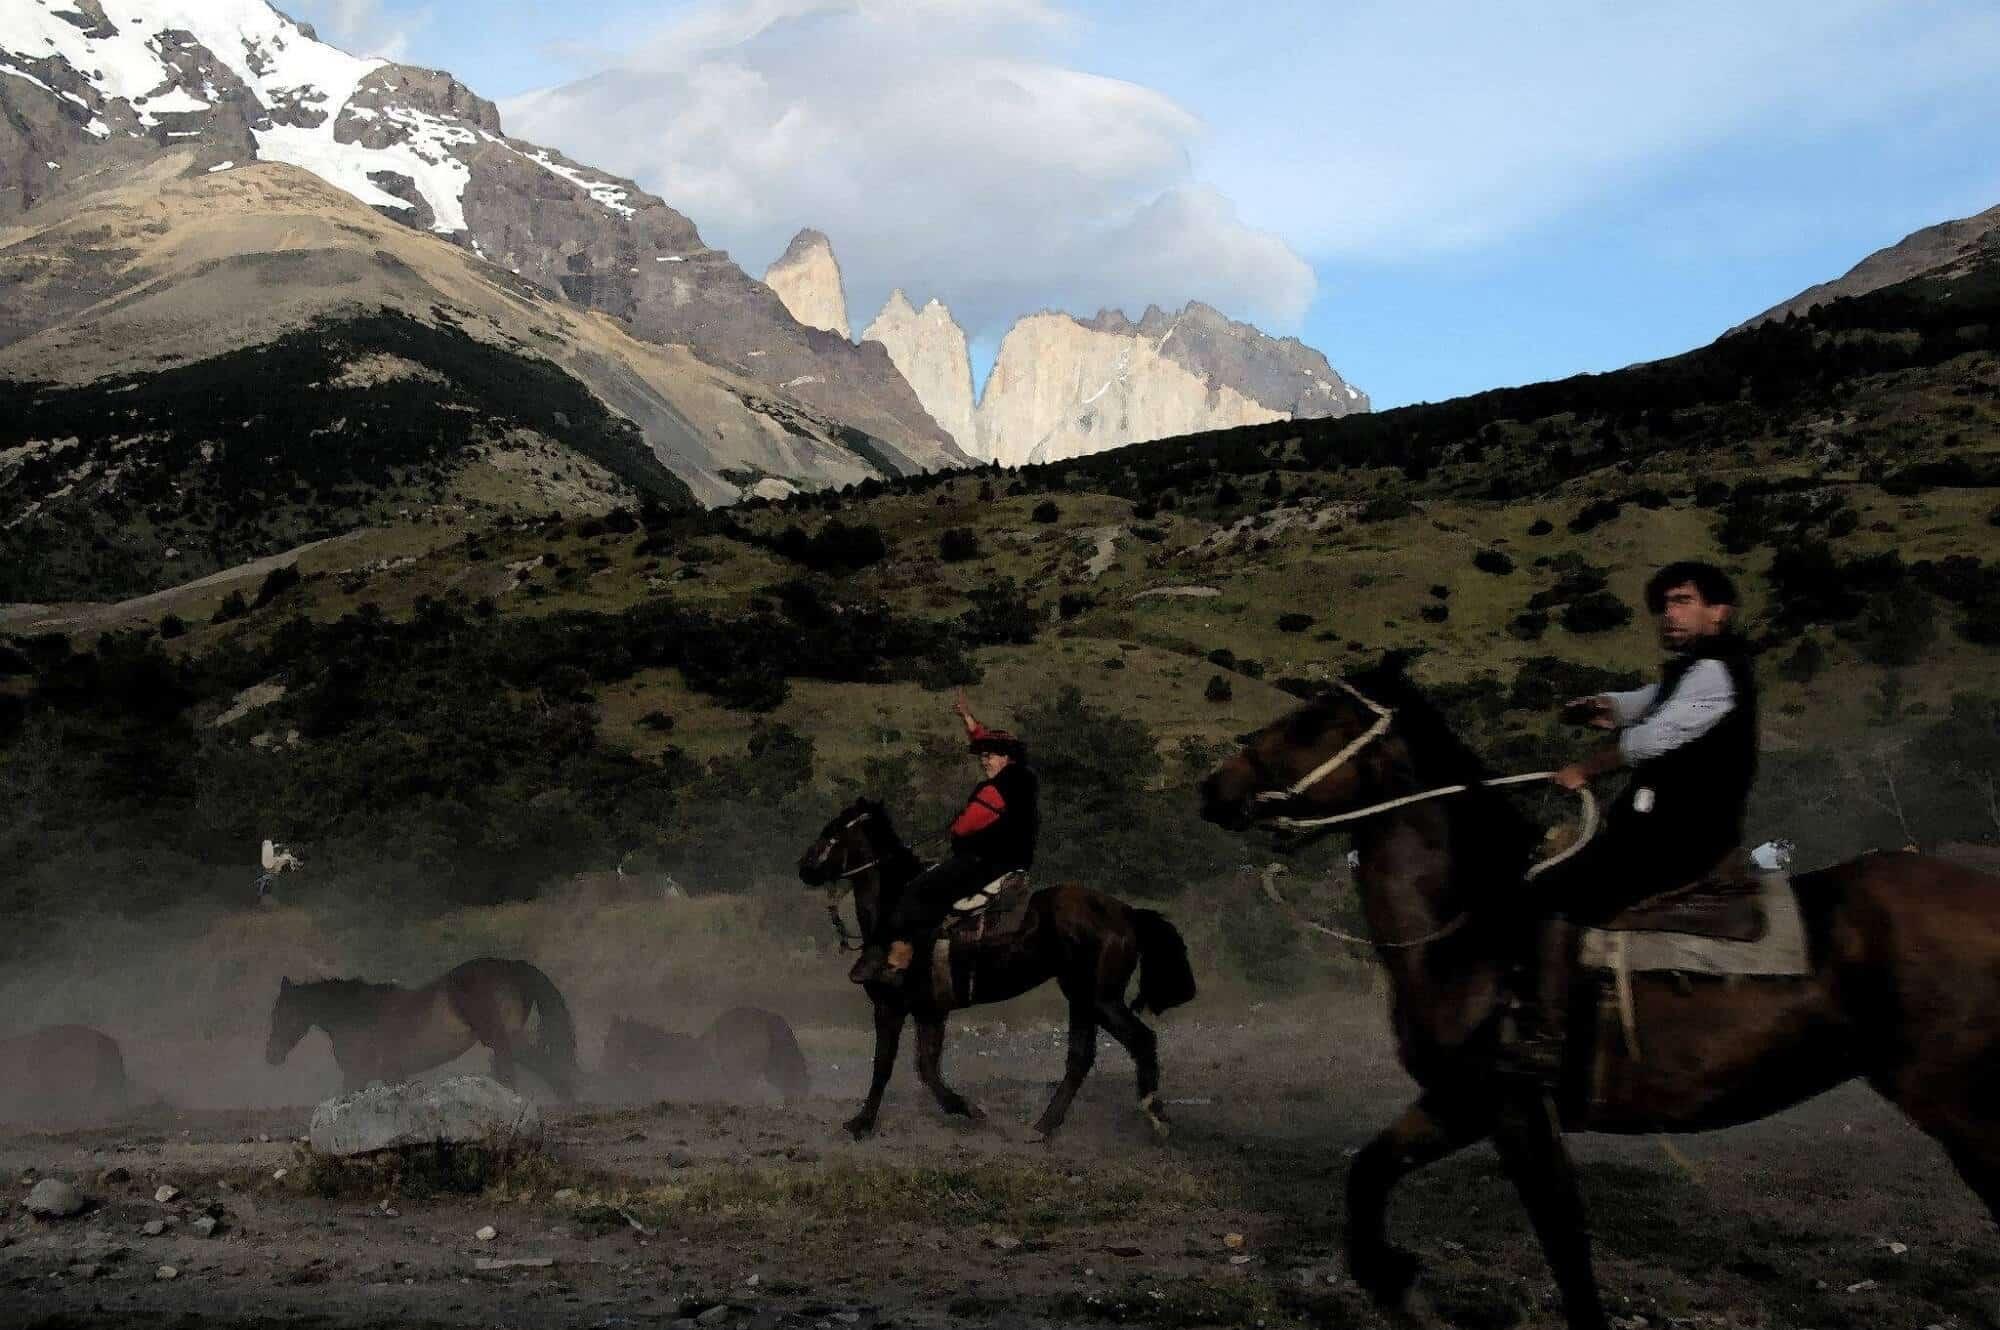 Gauchos on Horseback, Patagonia